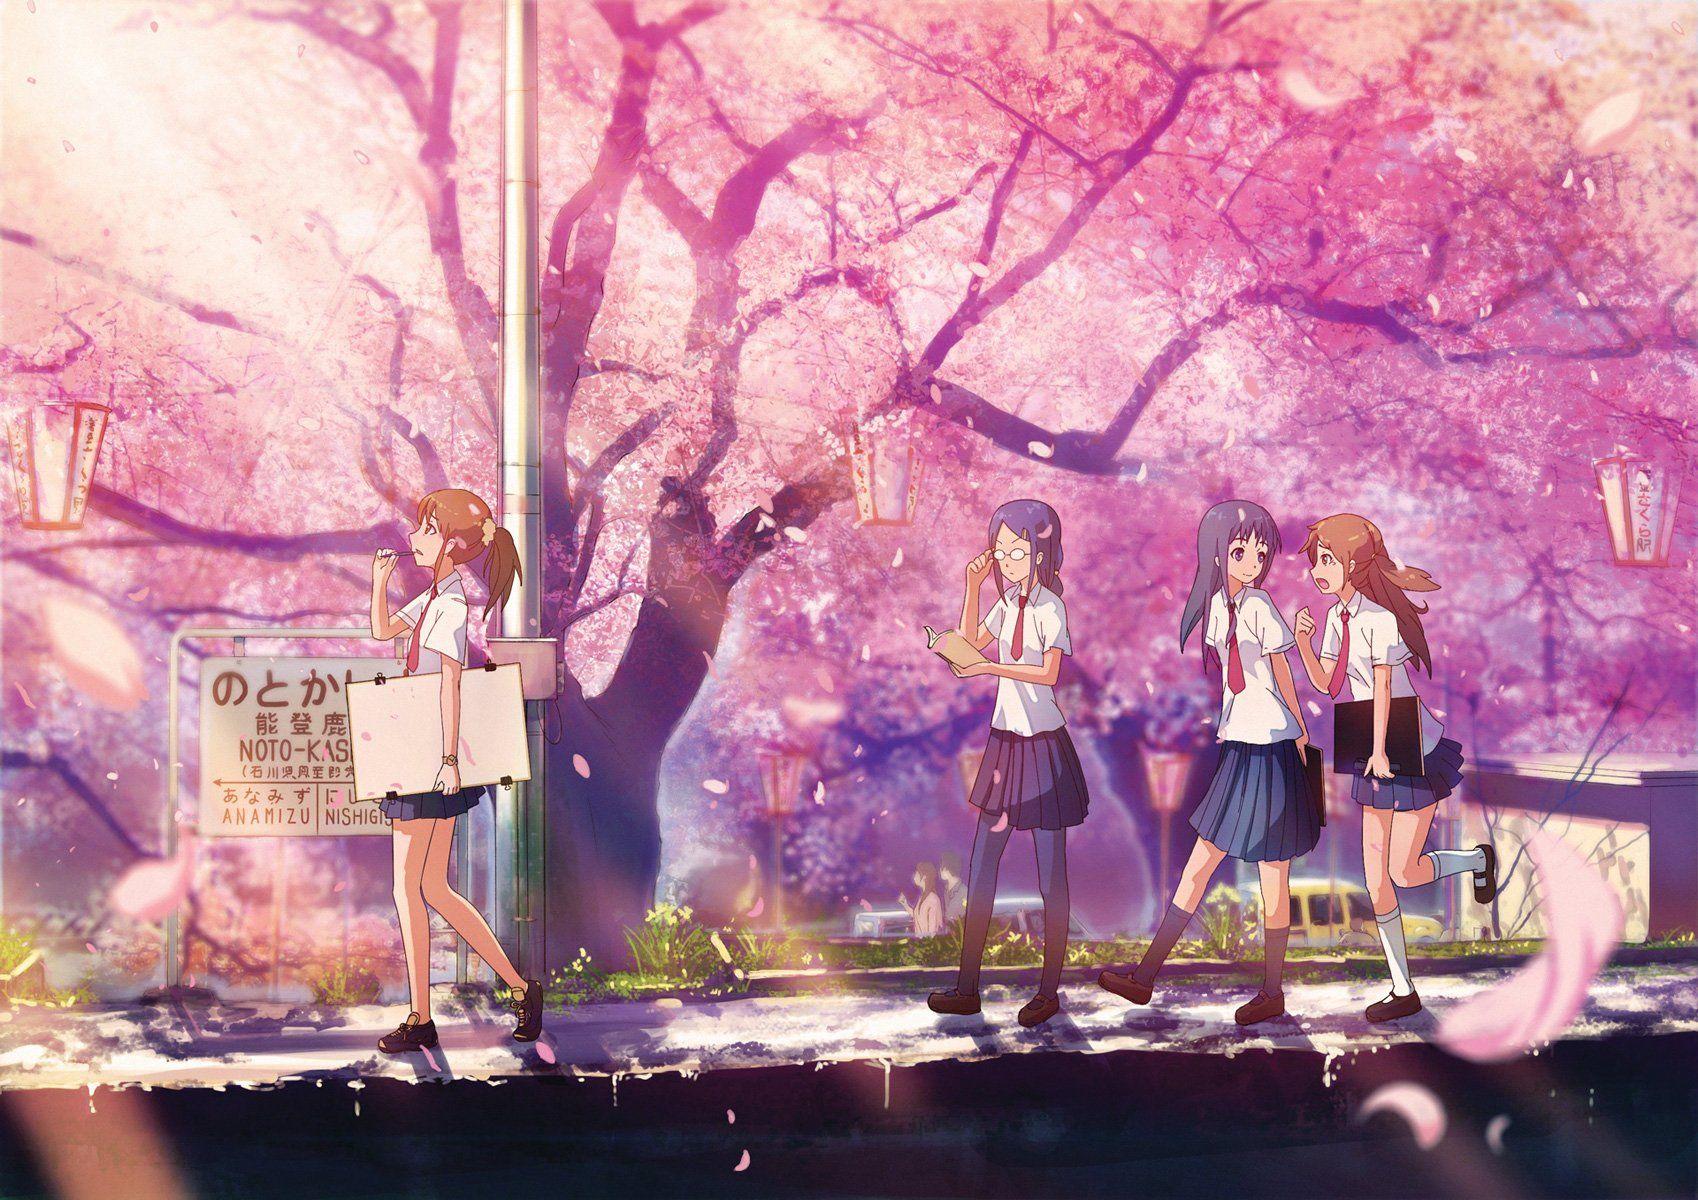 Noto Kashima Pink Light Petals Sakura Tree Group Friends Girls School Uniform Anime Wallpaper Anime Pemandangan Anime Wallpaper Pemandangan Anime